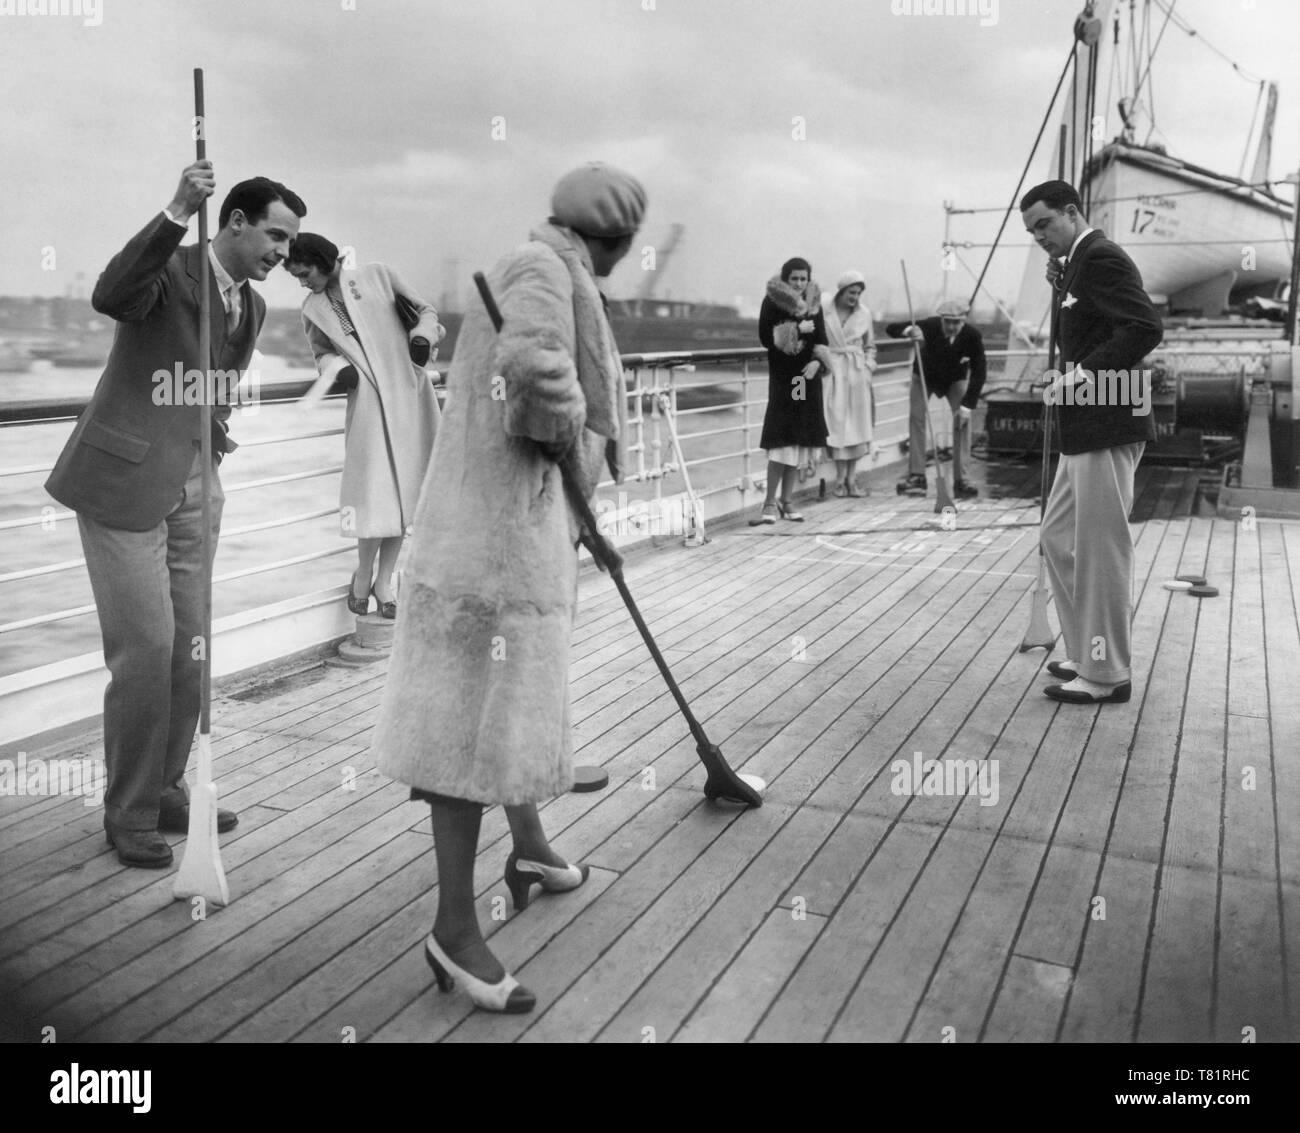 Shuffleboard Aboard the MS Vulcania - Stock Image